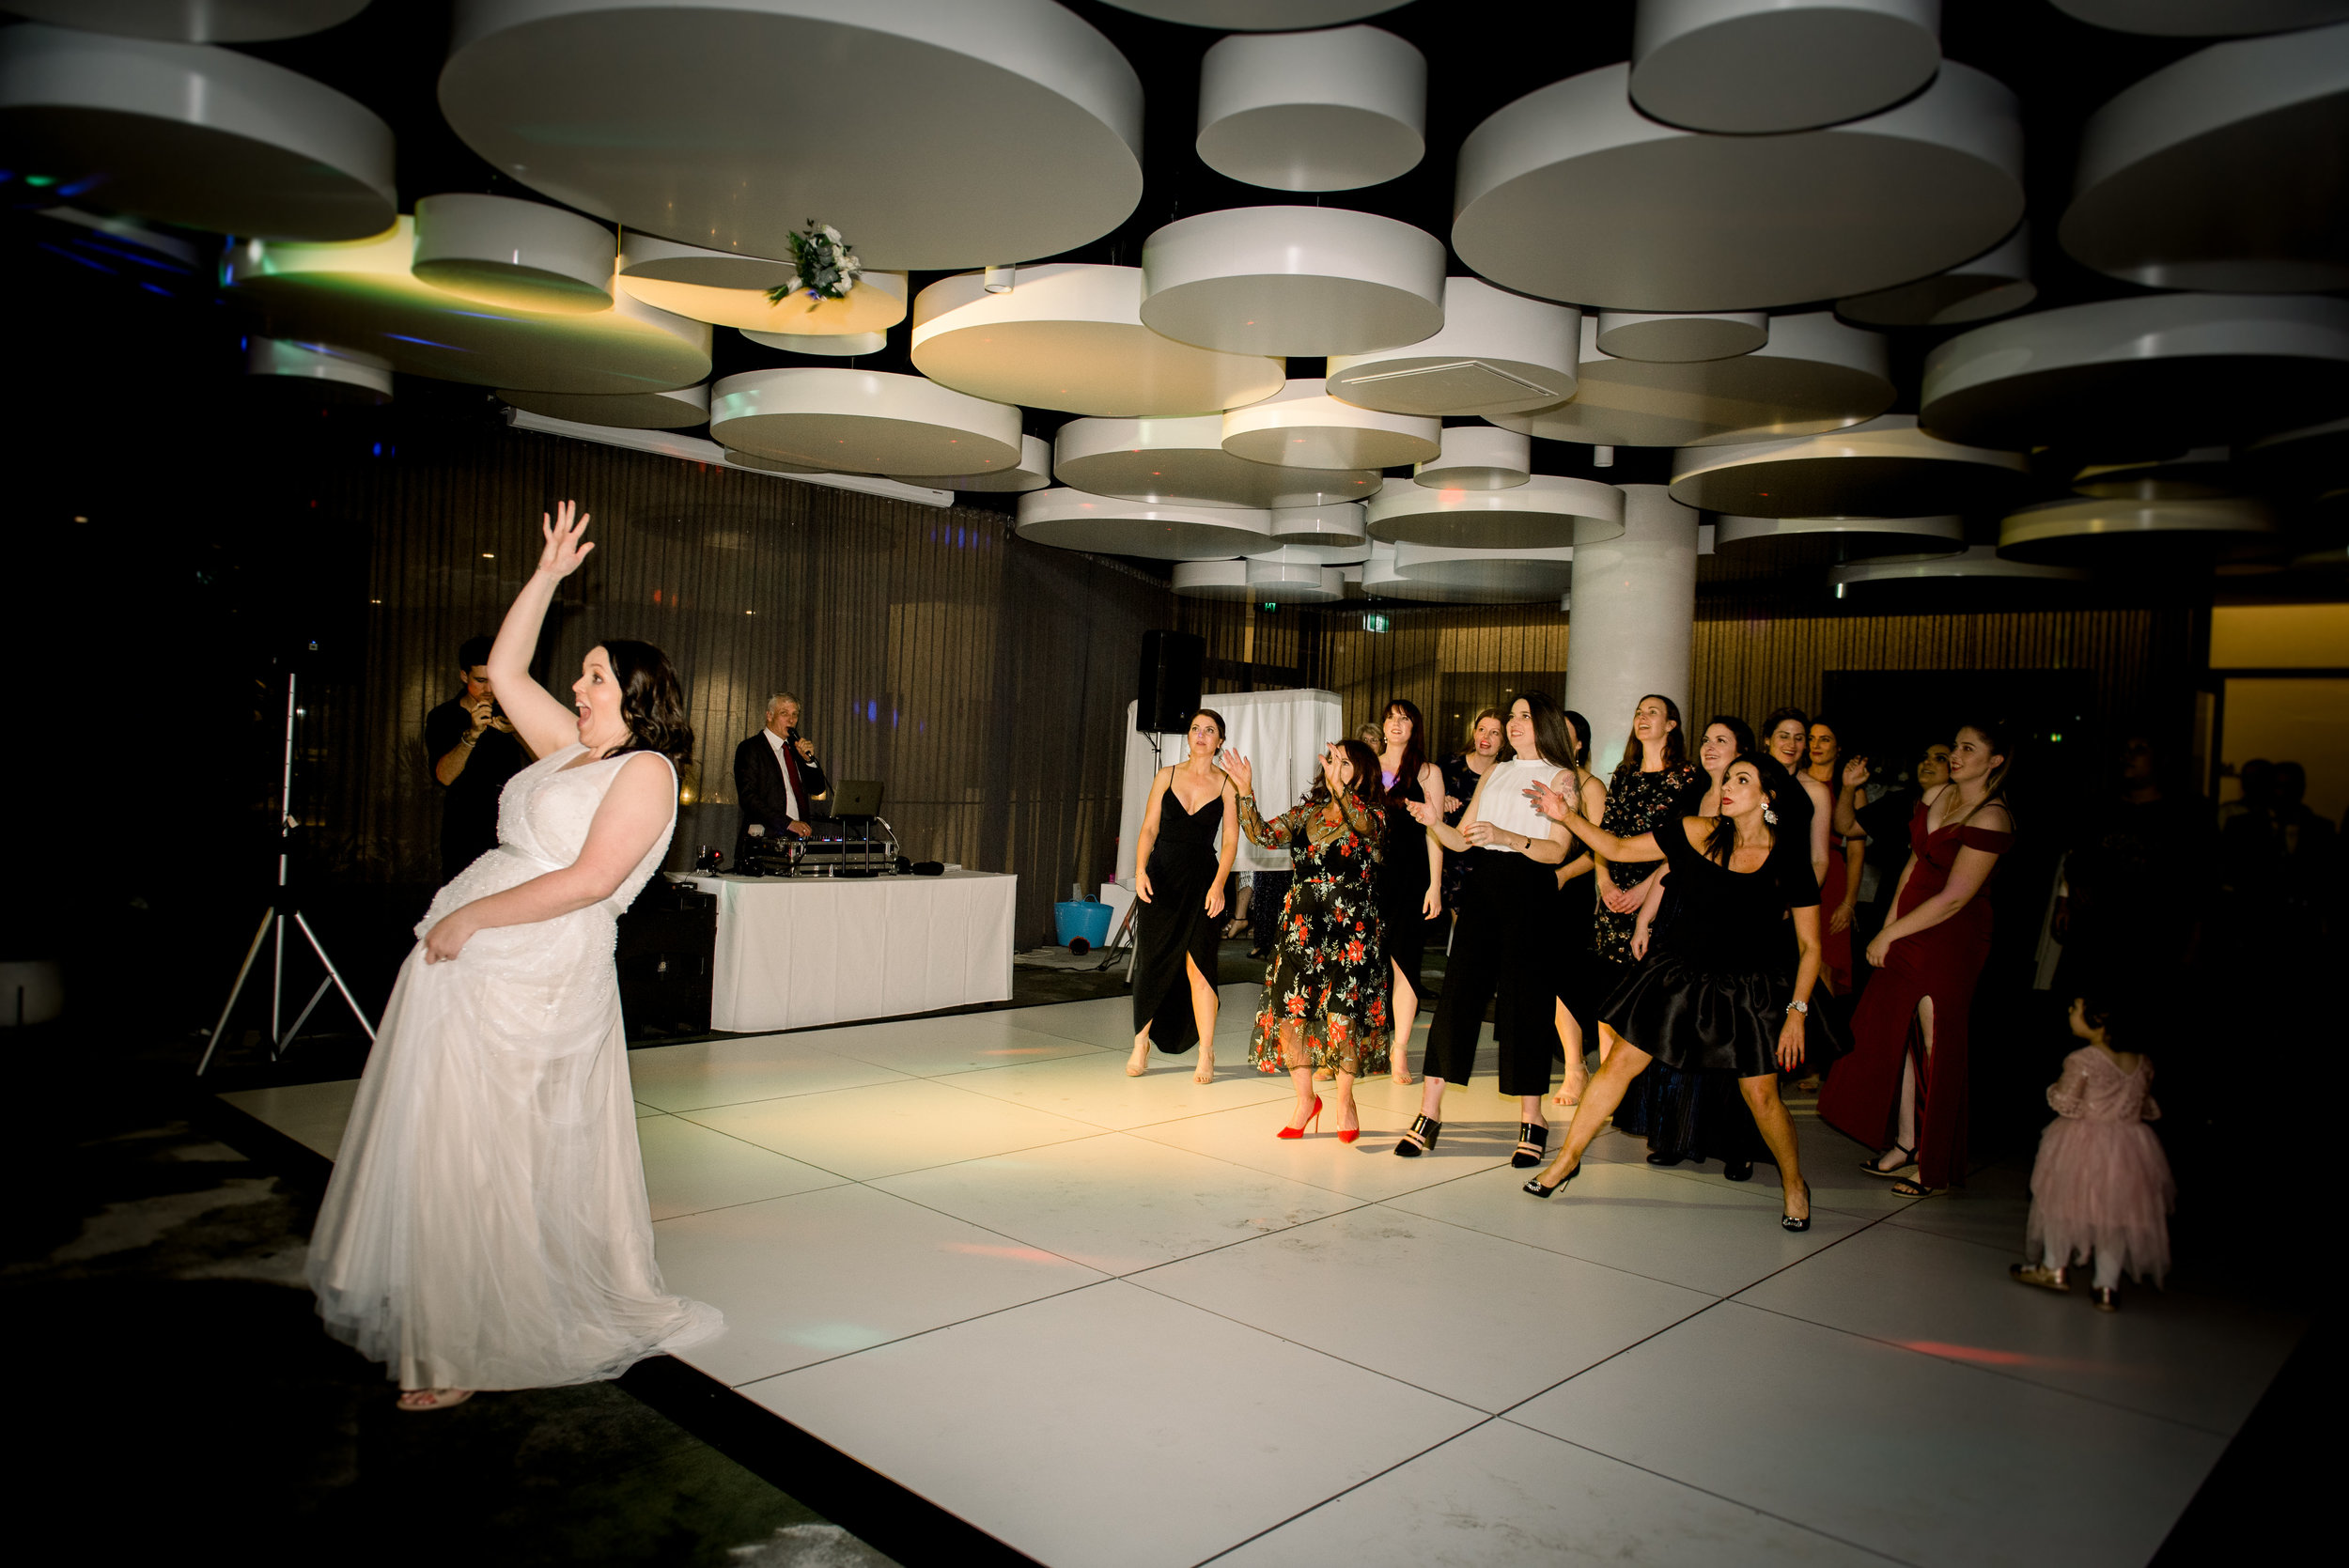 brisbane-city-wedding-photographer-romantic-wedding-136.jpg